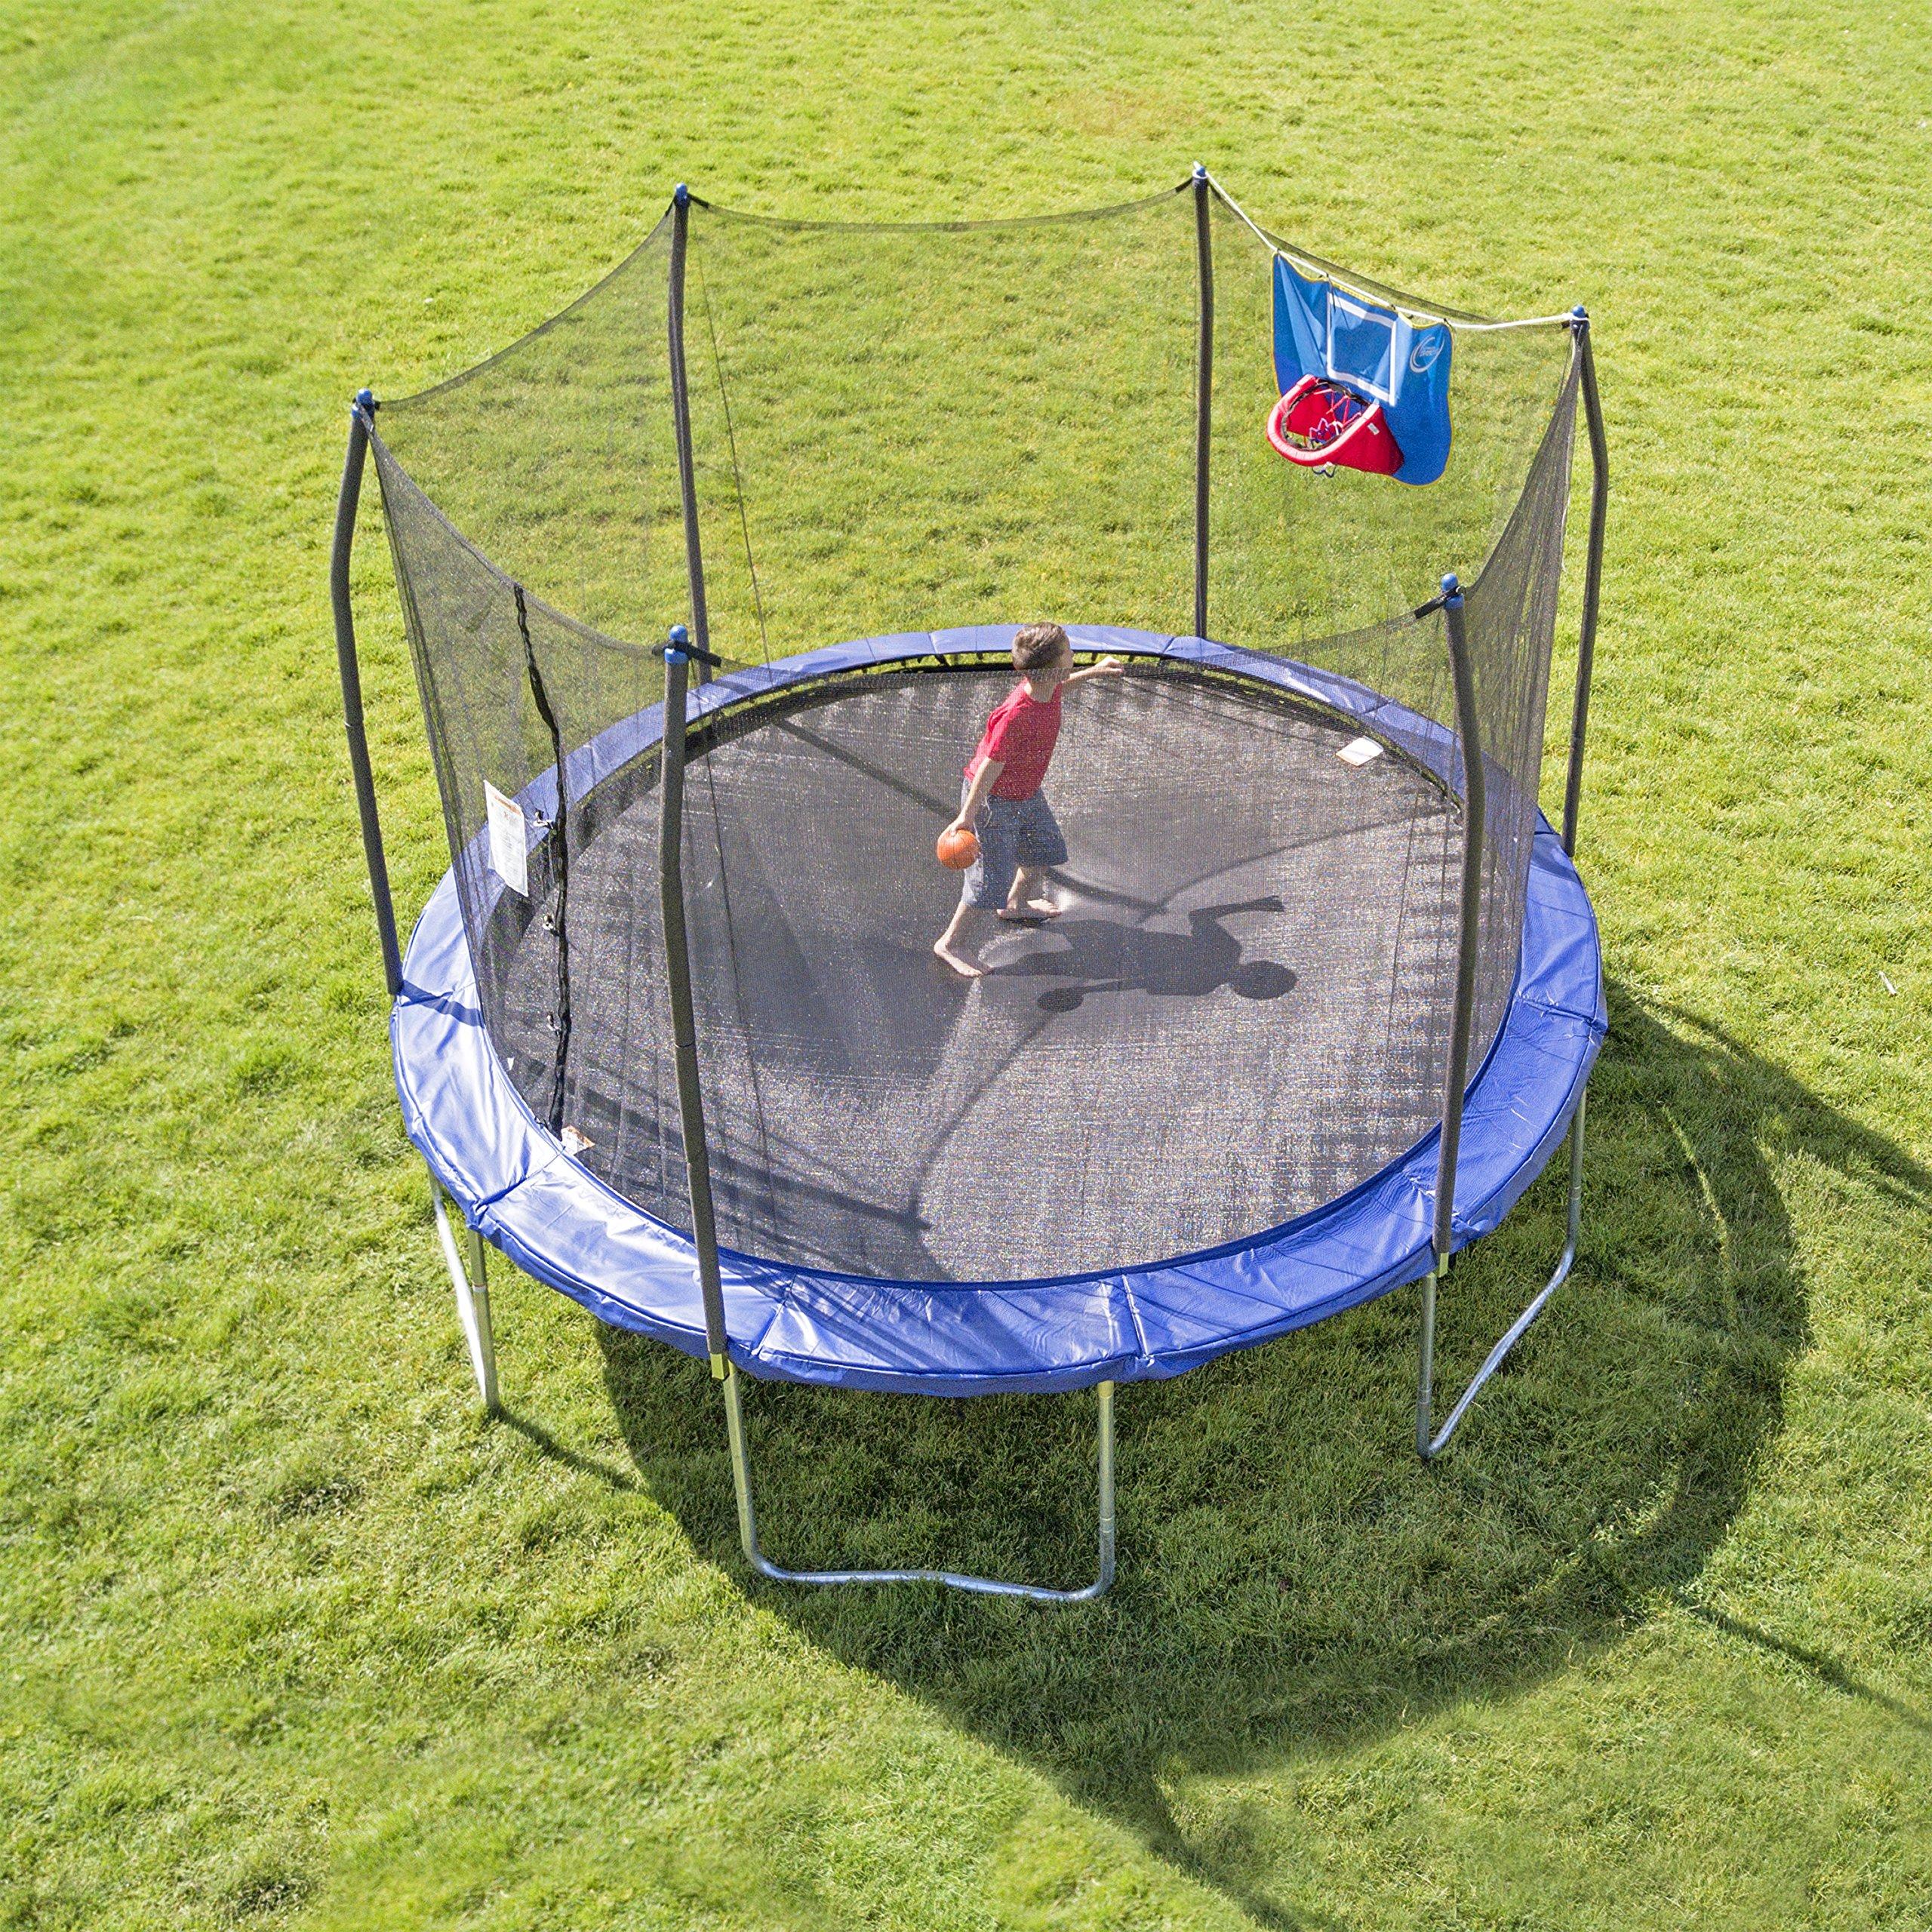 Skywalker Trampolines 12-Foot Jump N' Dunk Trampoline with Enclosure Net - Basketball Trampoline by Skywalker Trampolines (Image #2)